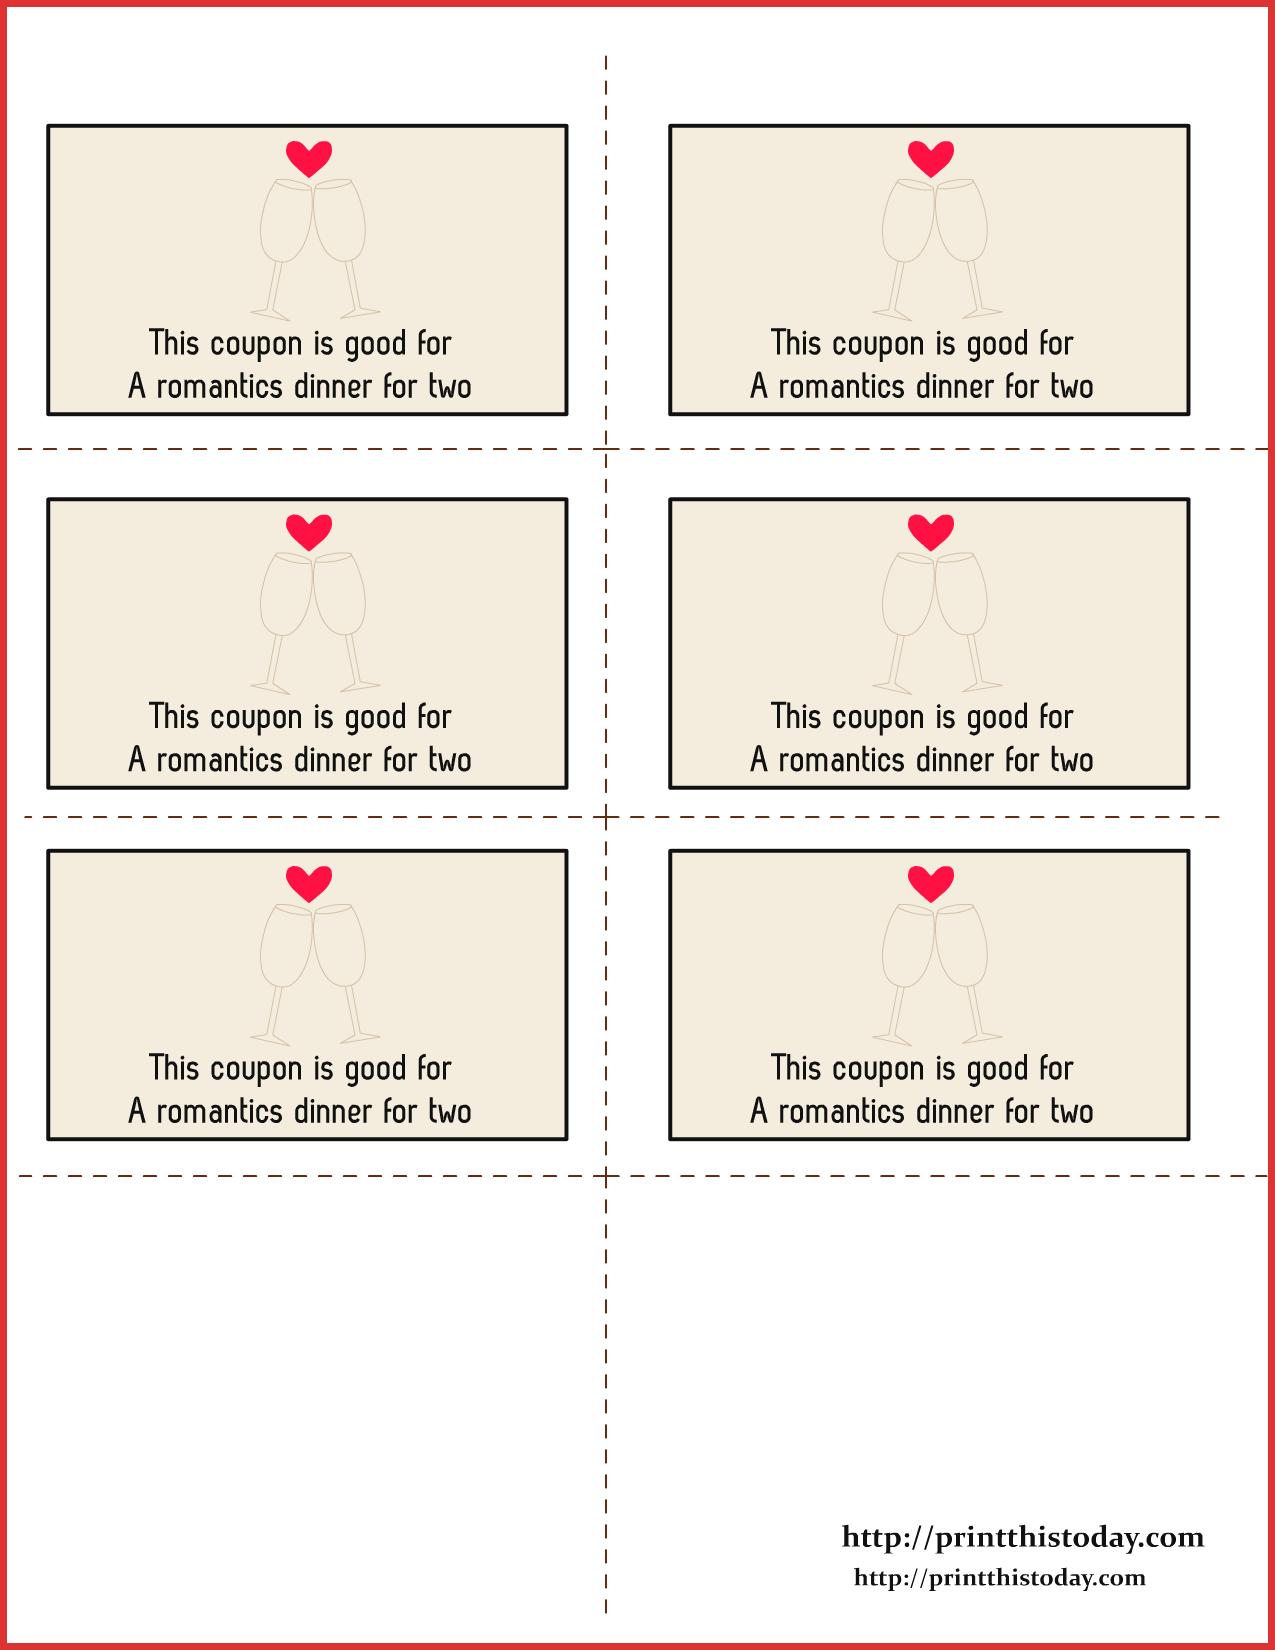 022 Free Printable Coupon Templates Template Ideas Love Fresh Best - Free Printable Coupon Templates